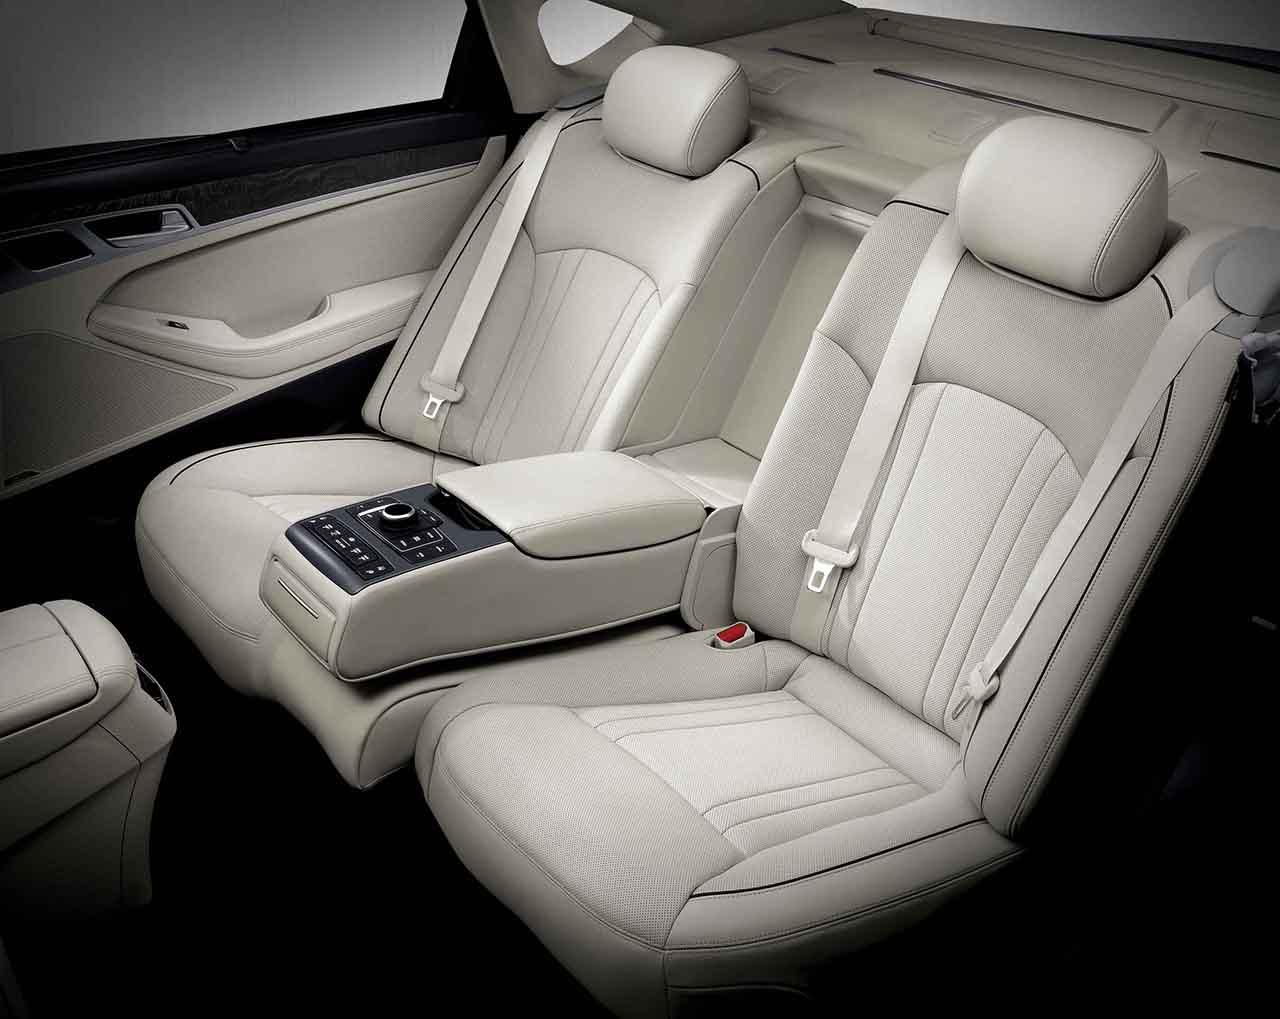 Hyundai Azera 2013 Confira Avaliacao Do in addition Name That Shifter No 119 besides 10 Fastest Cars Under 50k 117082 additionally 100577646 2017 Buick Lacrosse 4 Door Sedan Essence Fwd Angular Rear Exterior View furthermore 2015 Opel Corsa Sport Za. on 2013 hyundai genesis sedan